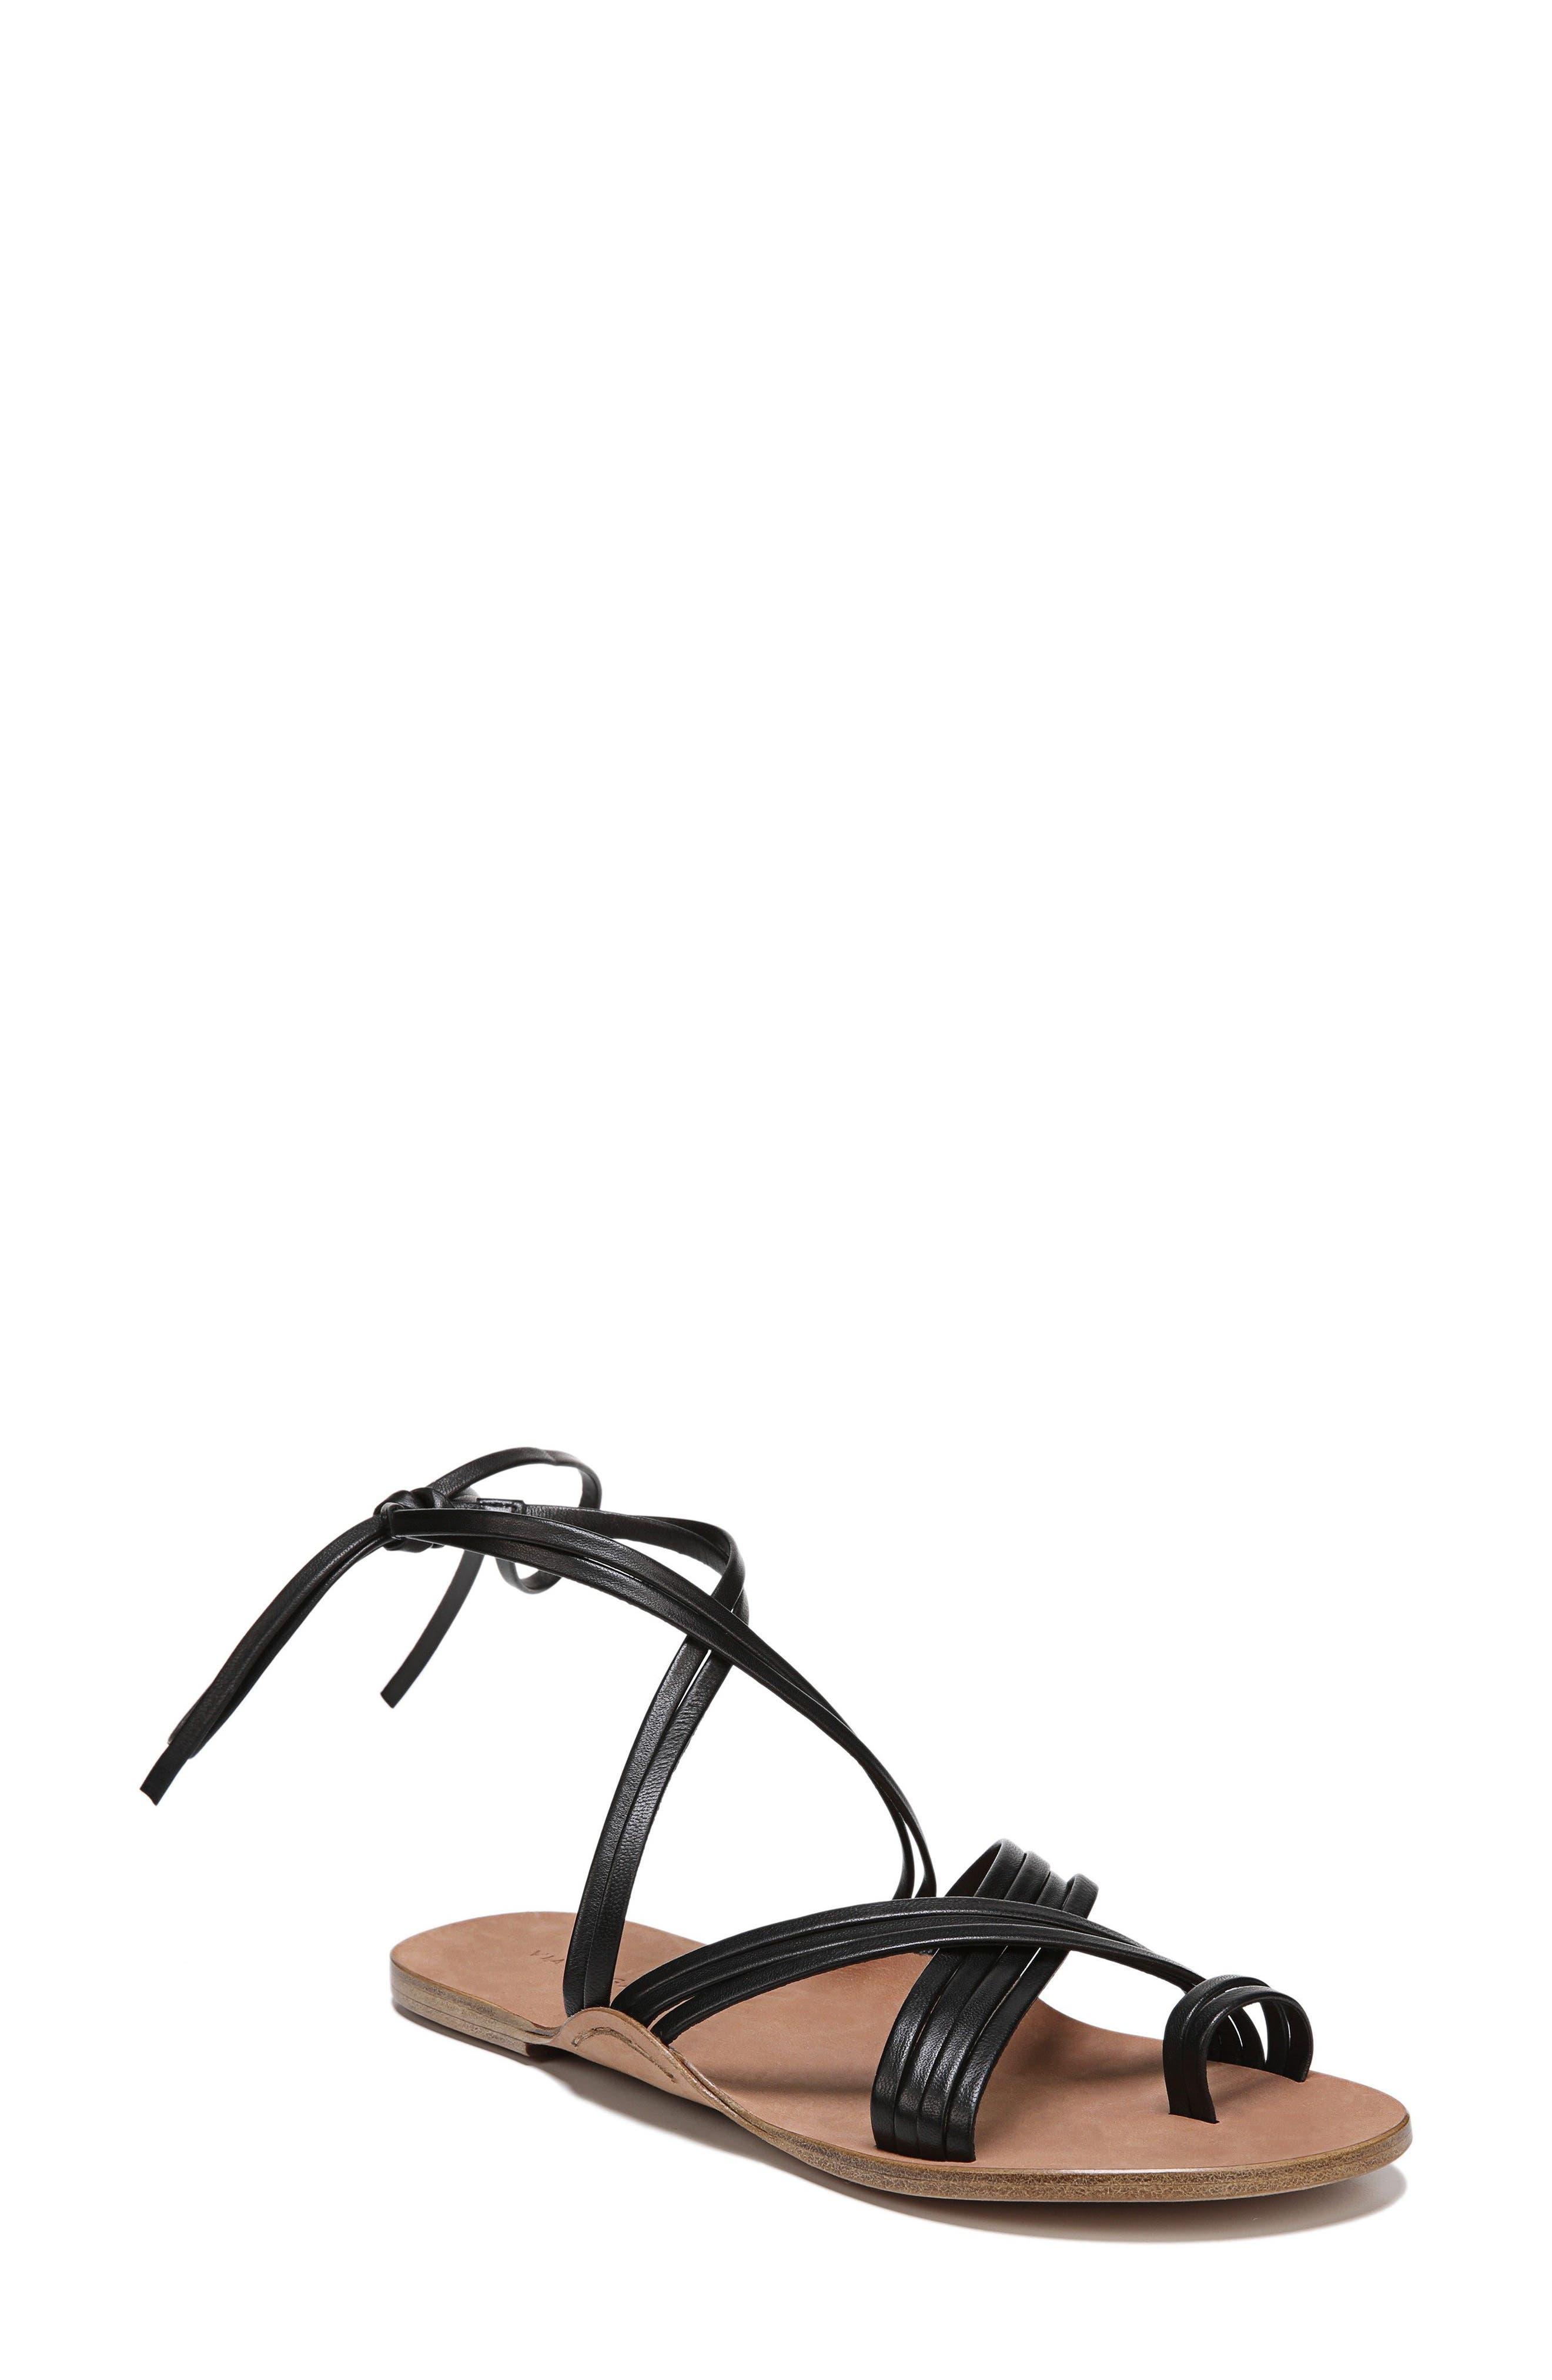 Allegra Sandal,                         Main,                         color, 003